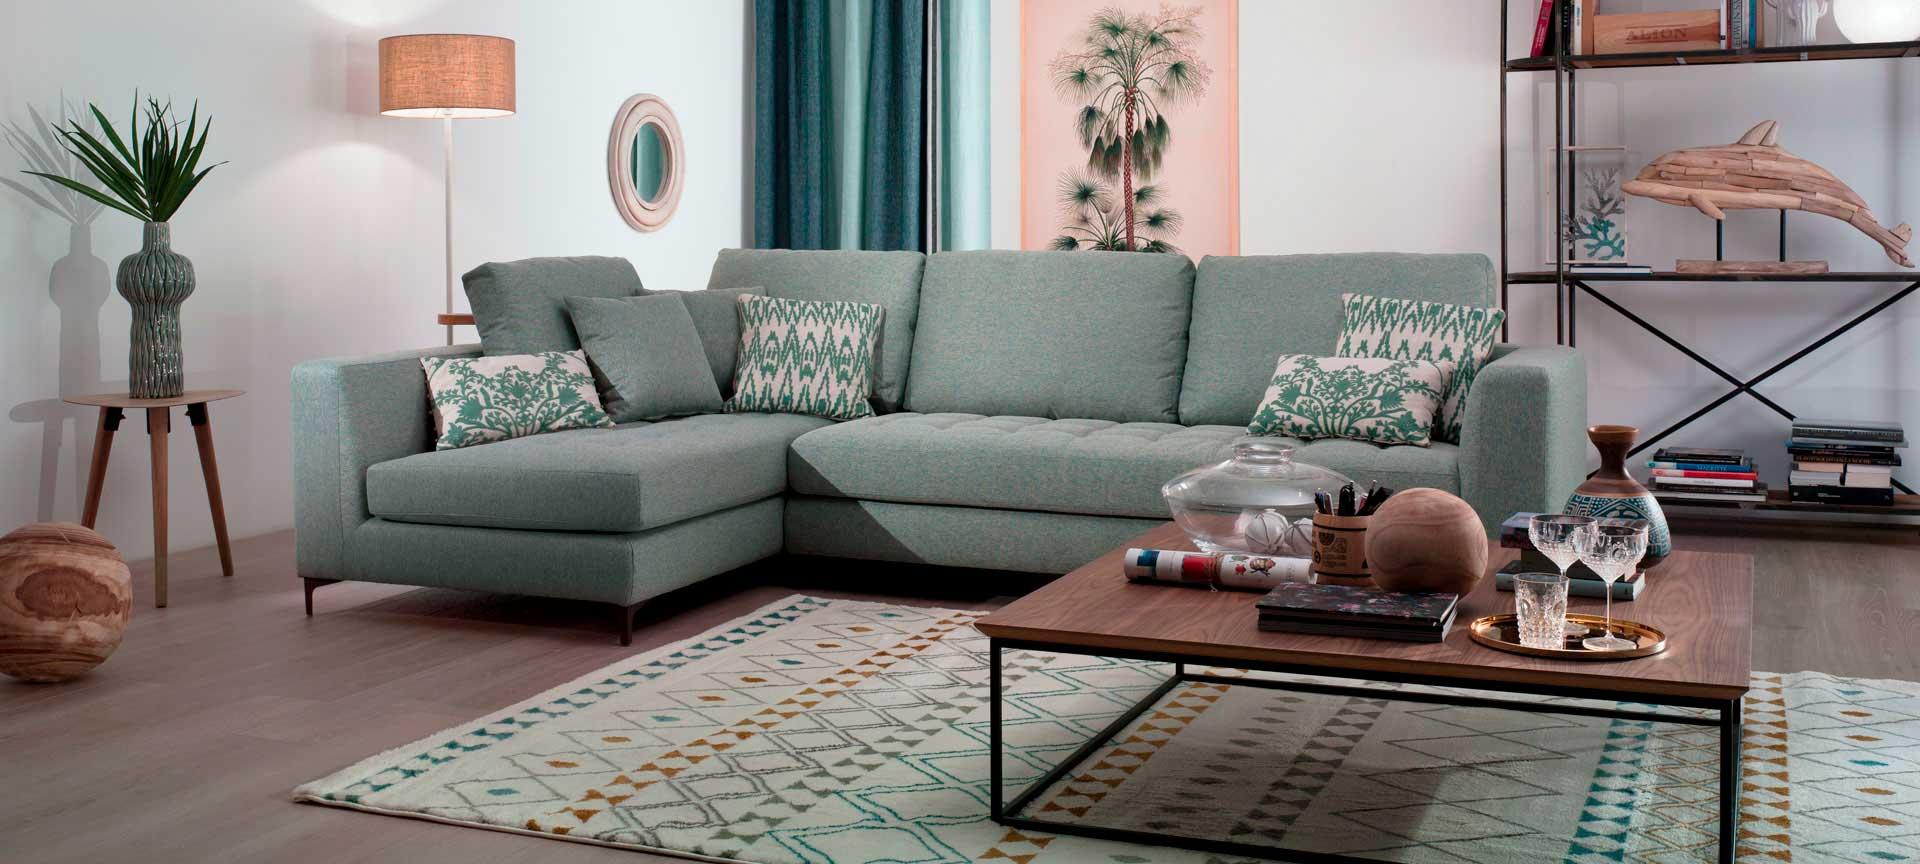 sofa rinconera Rock color verde suave mimma gallery